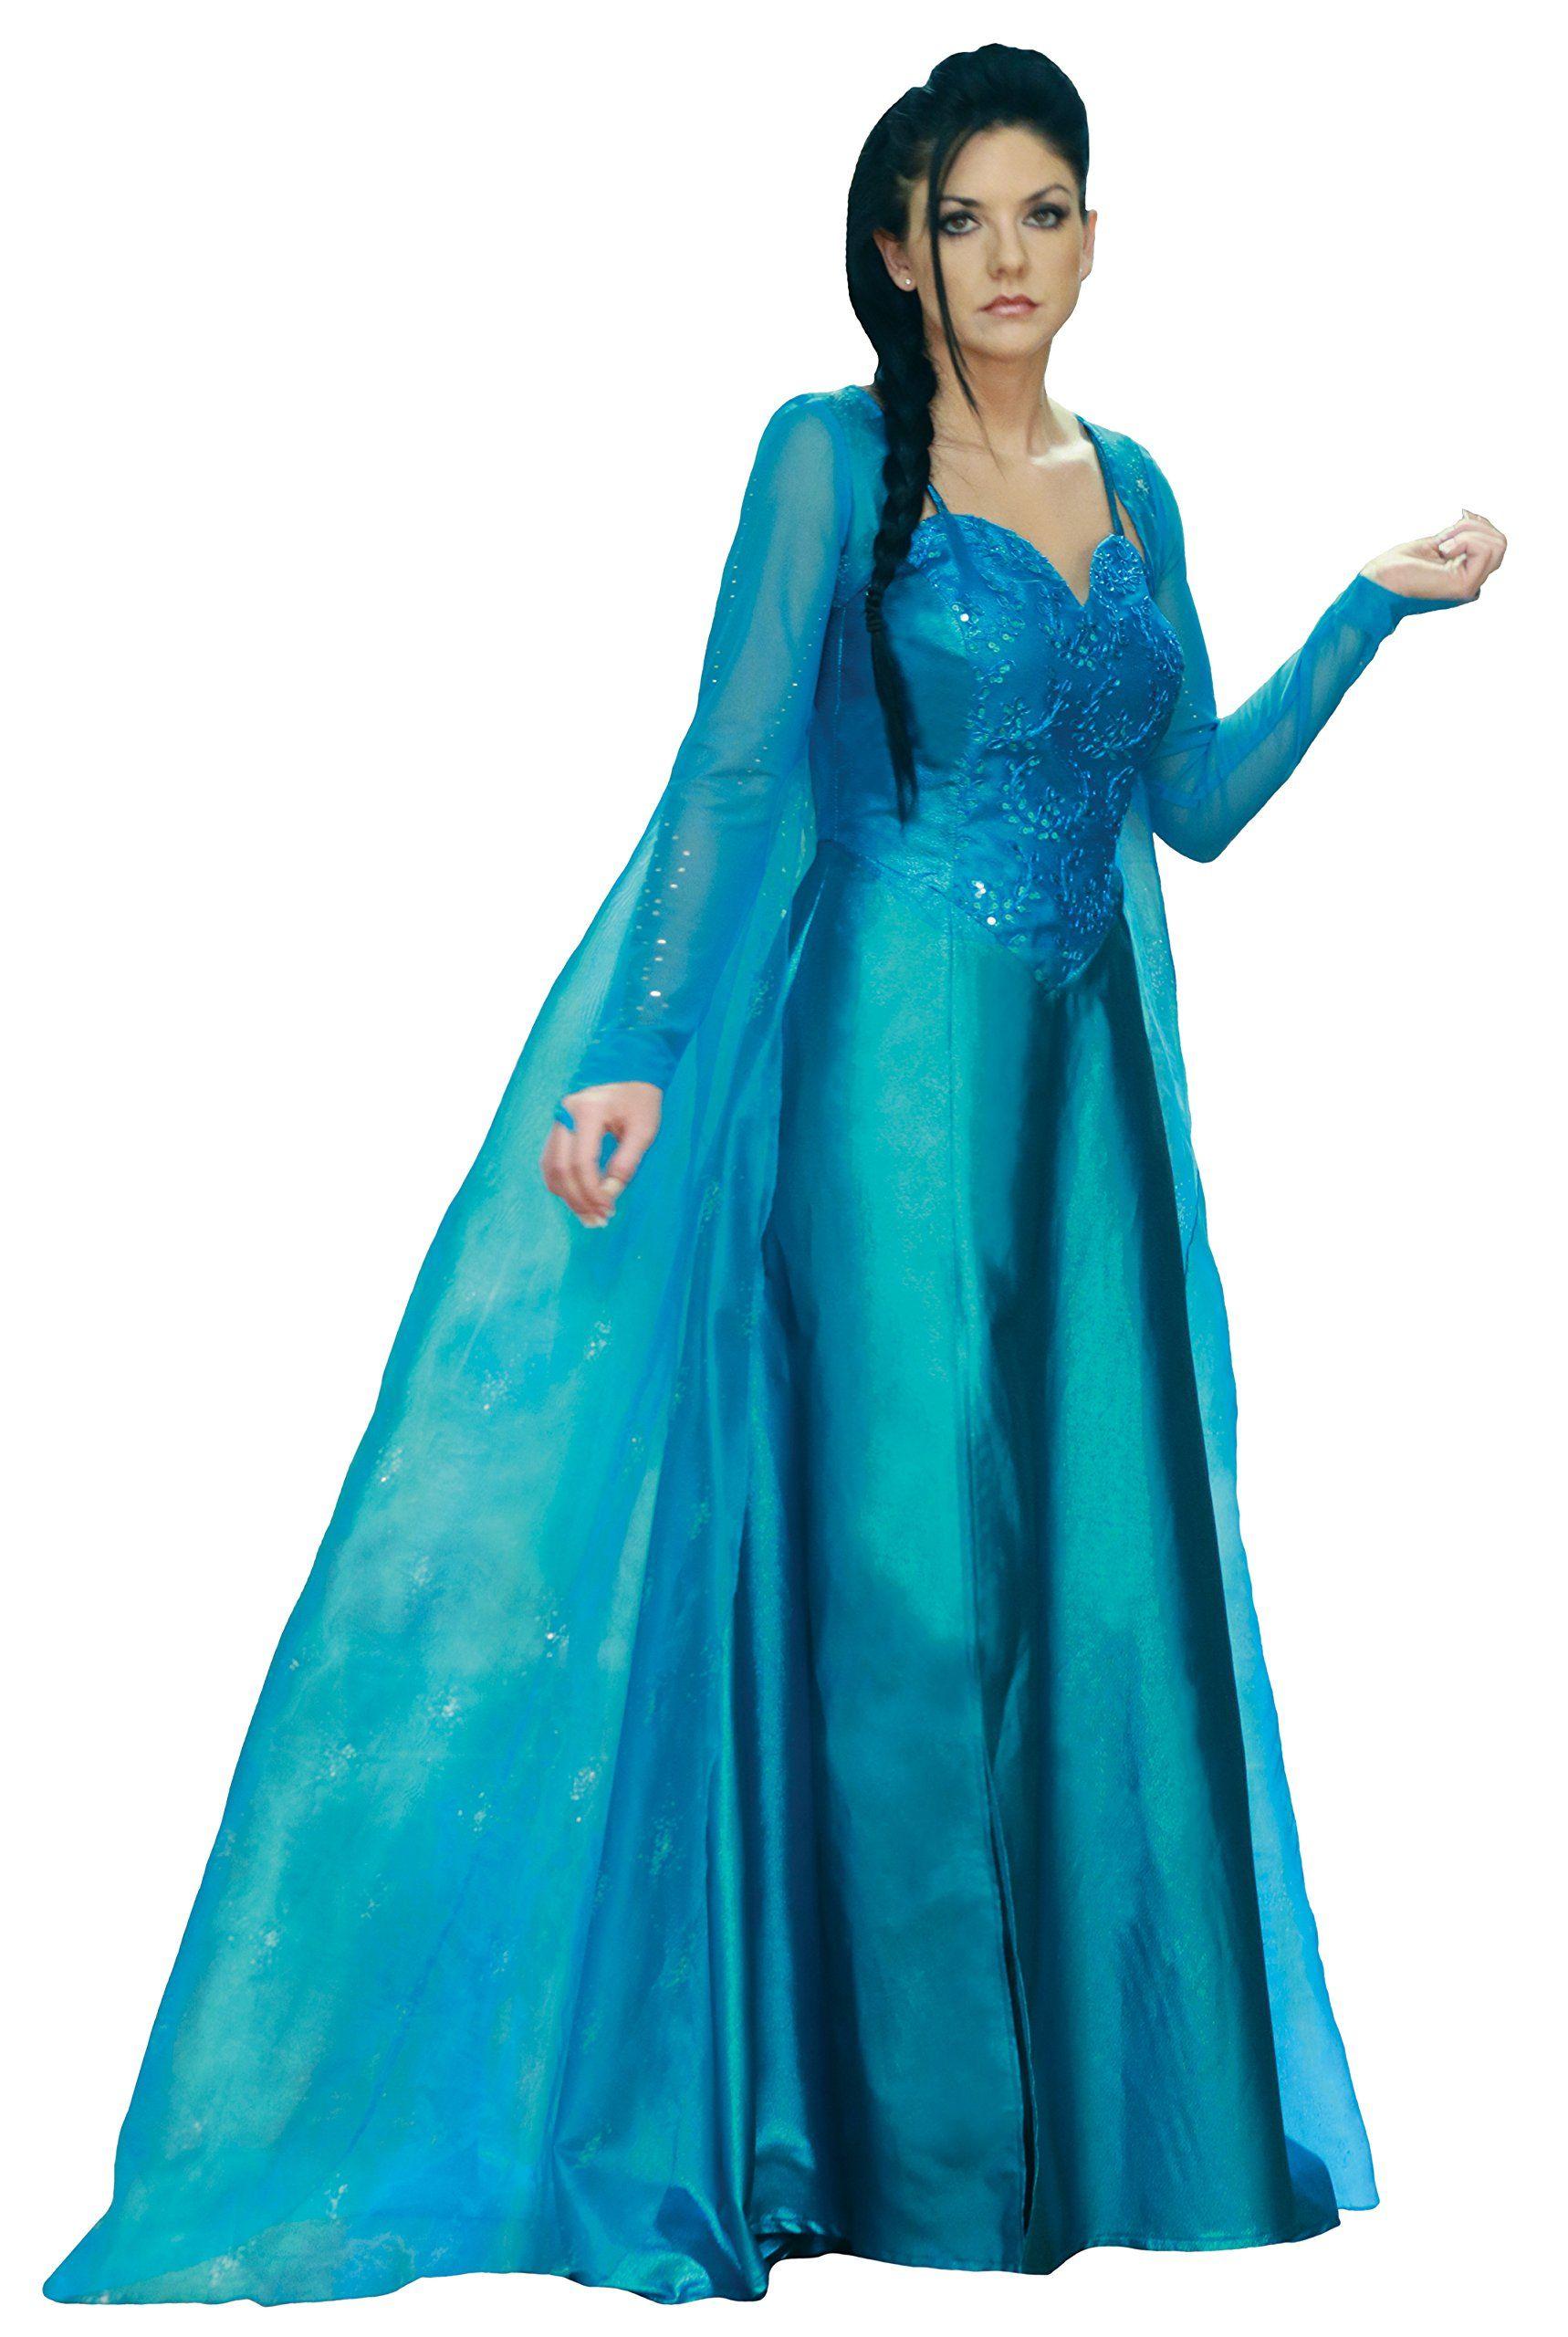 Amazon.com: Ice Princess Costume: Clothing | Ice fairy dress ...